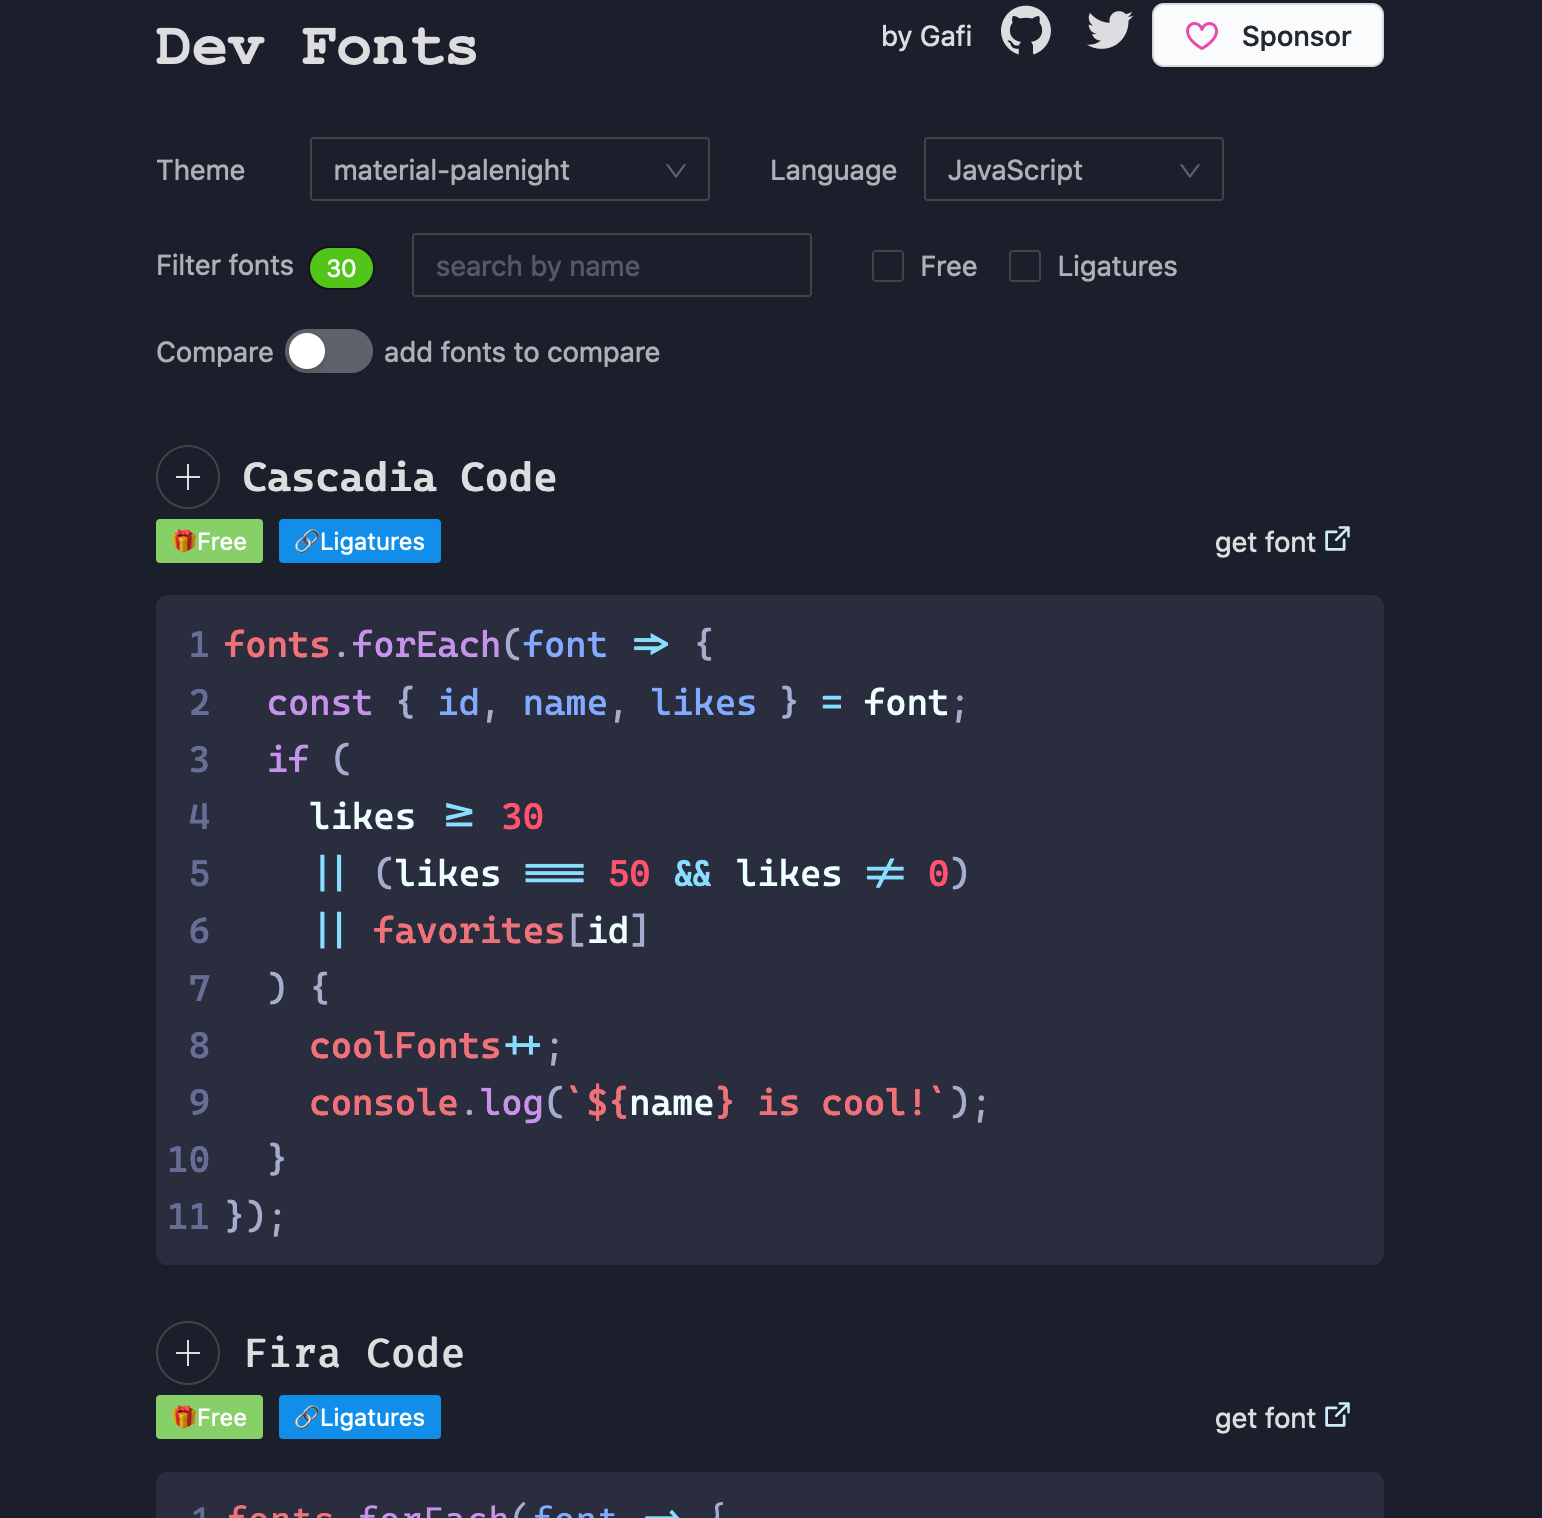 Dev fonts showing font previews